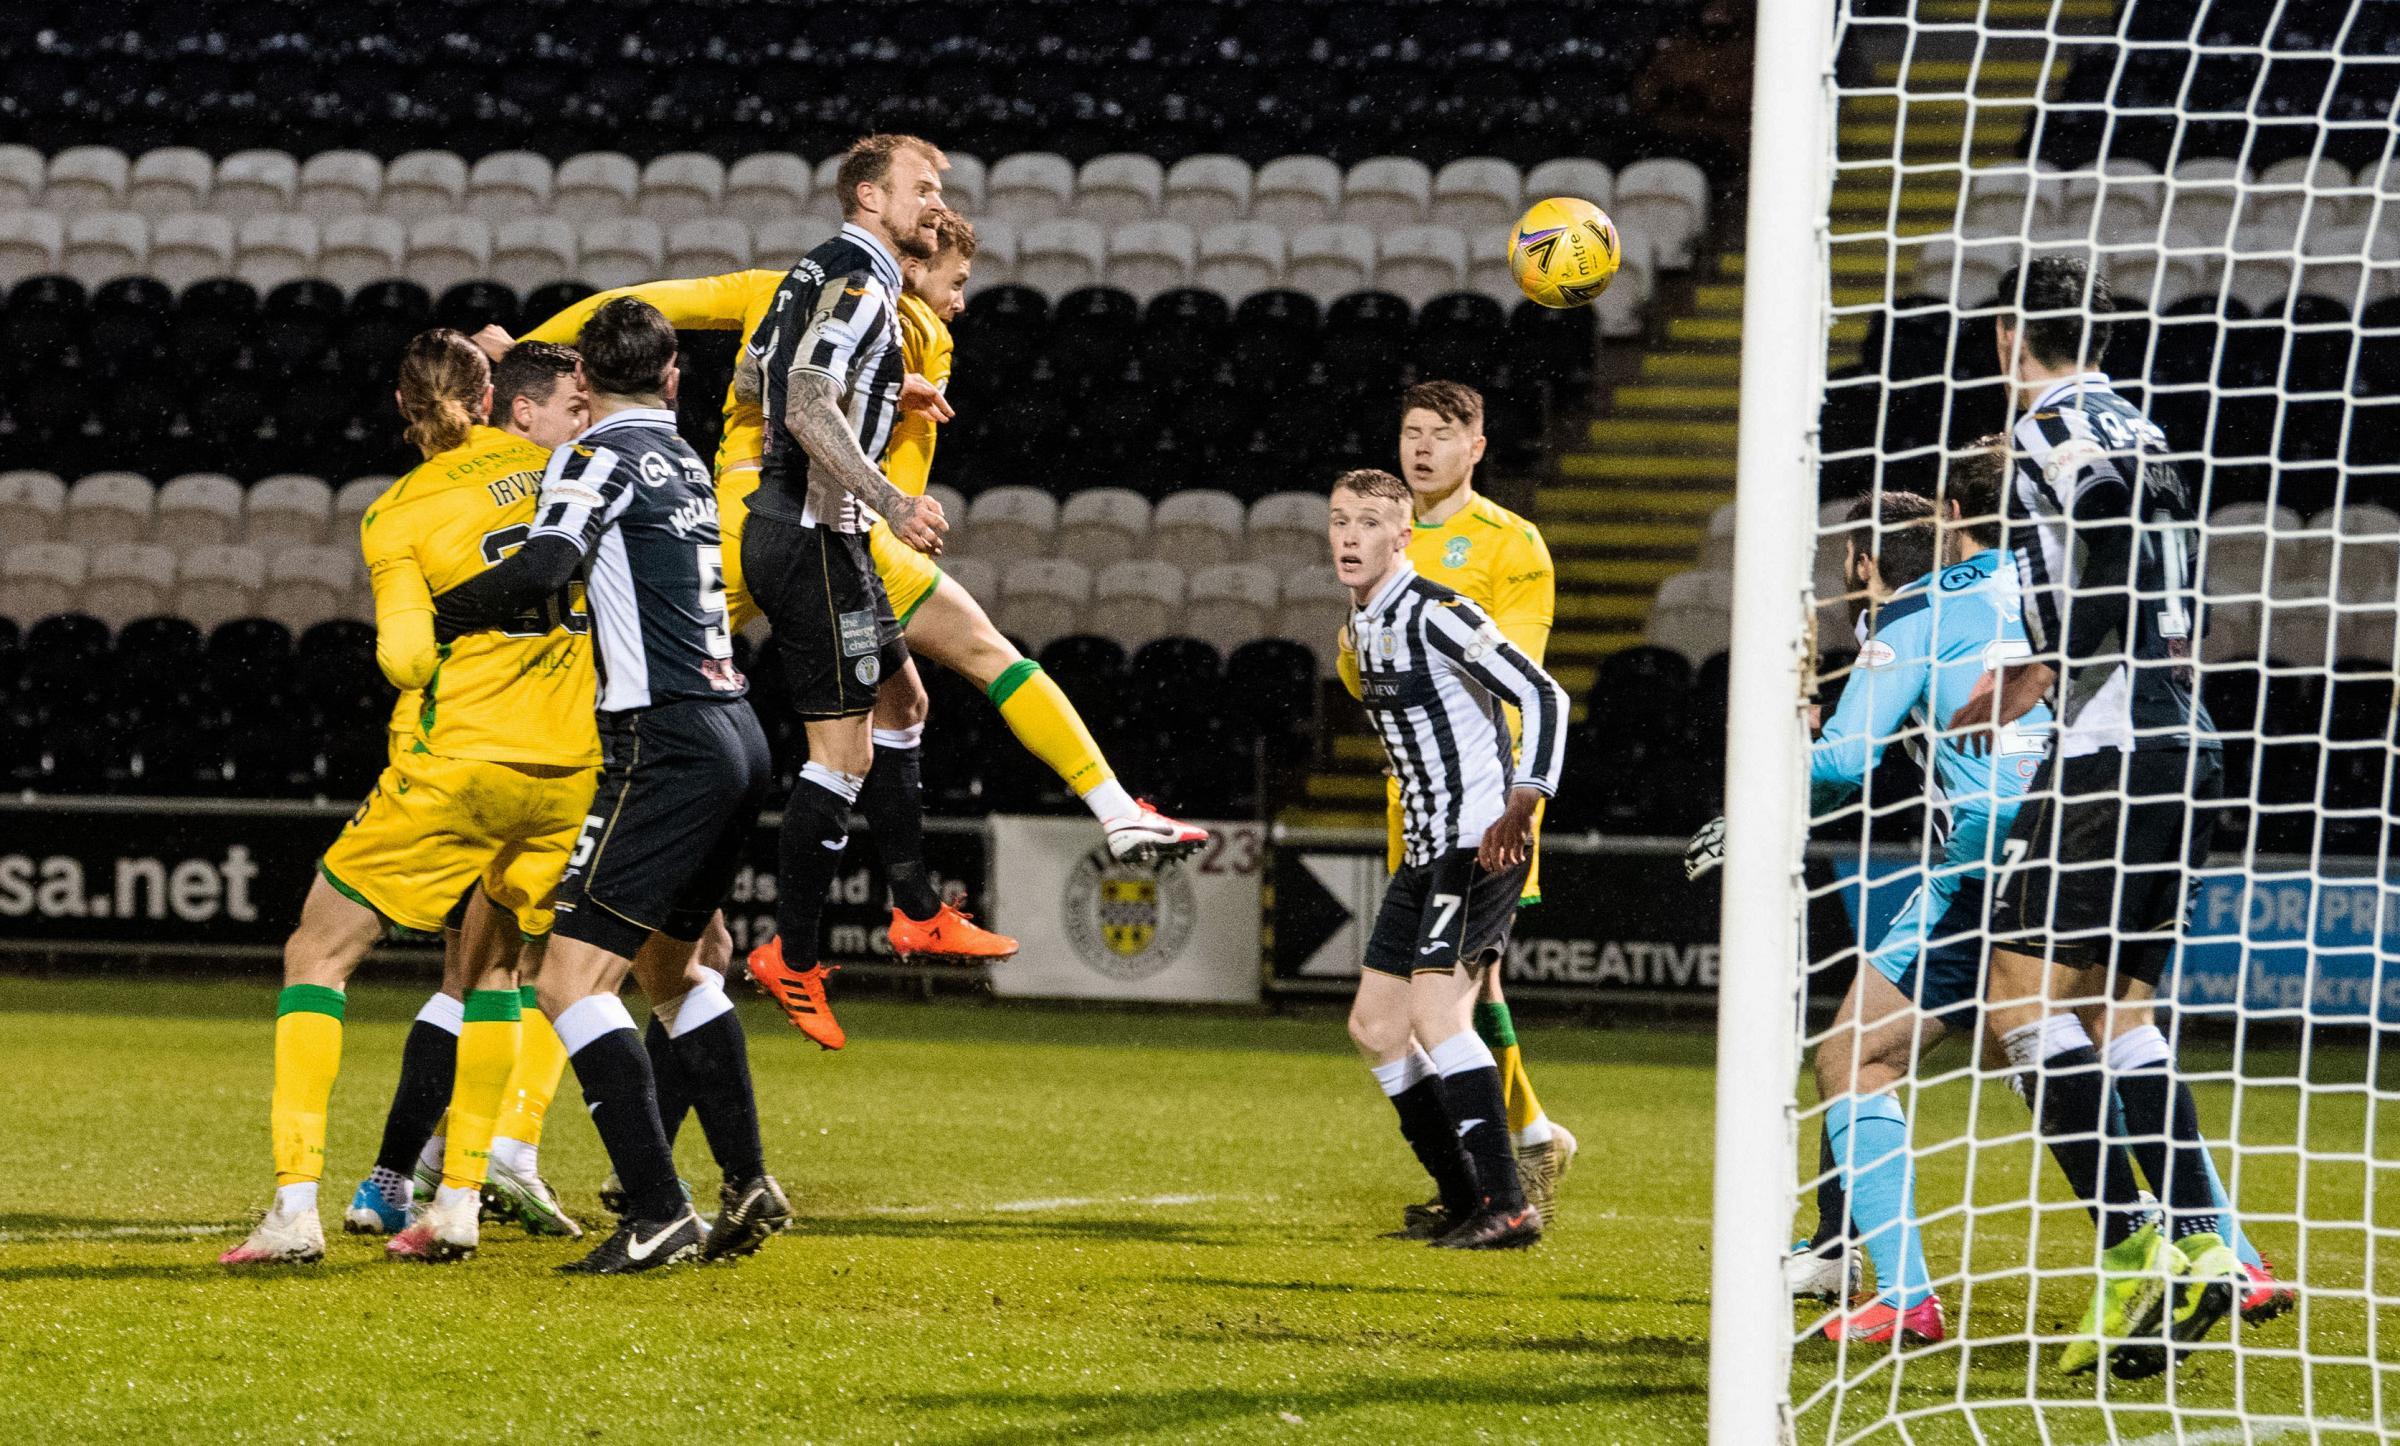 St Mirren 1-2 Hibernian: Ryan Porteous makes quick impact